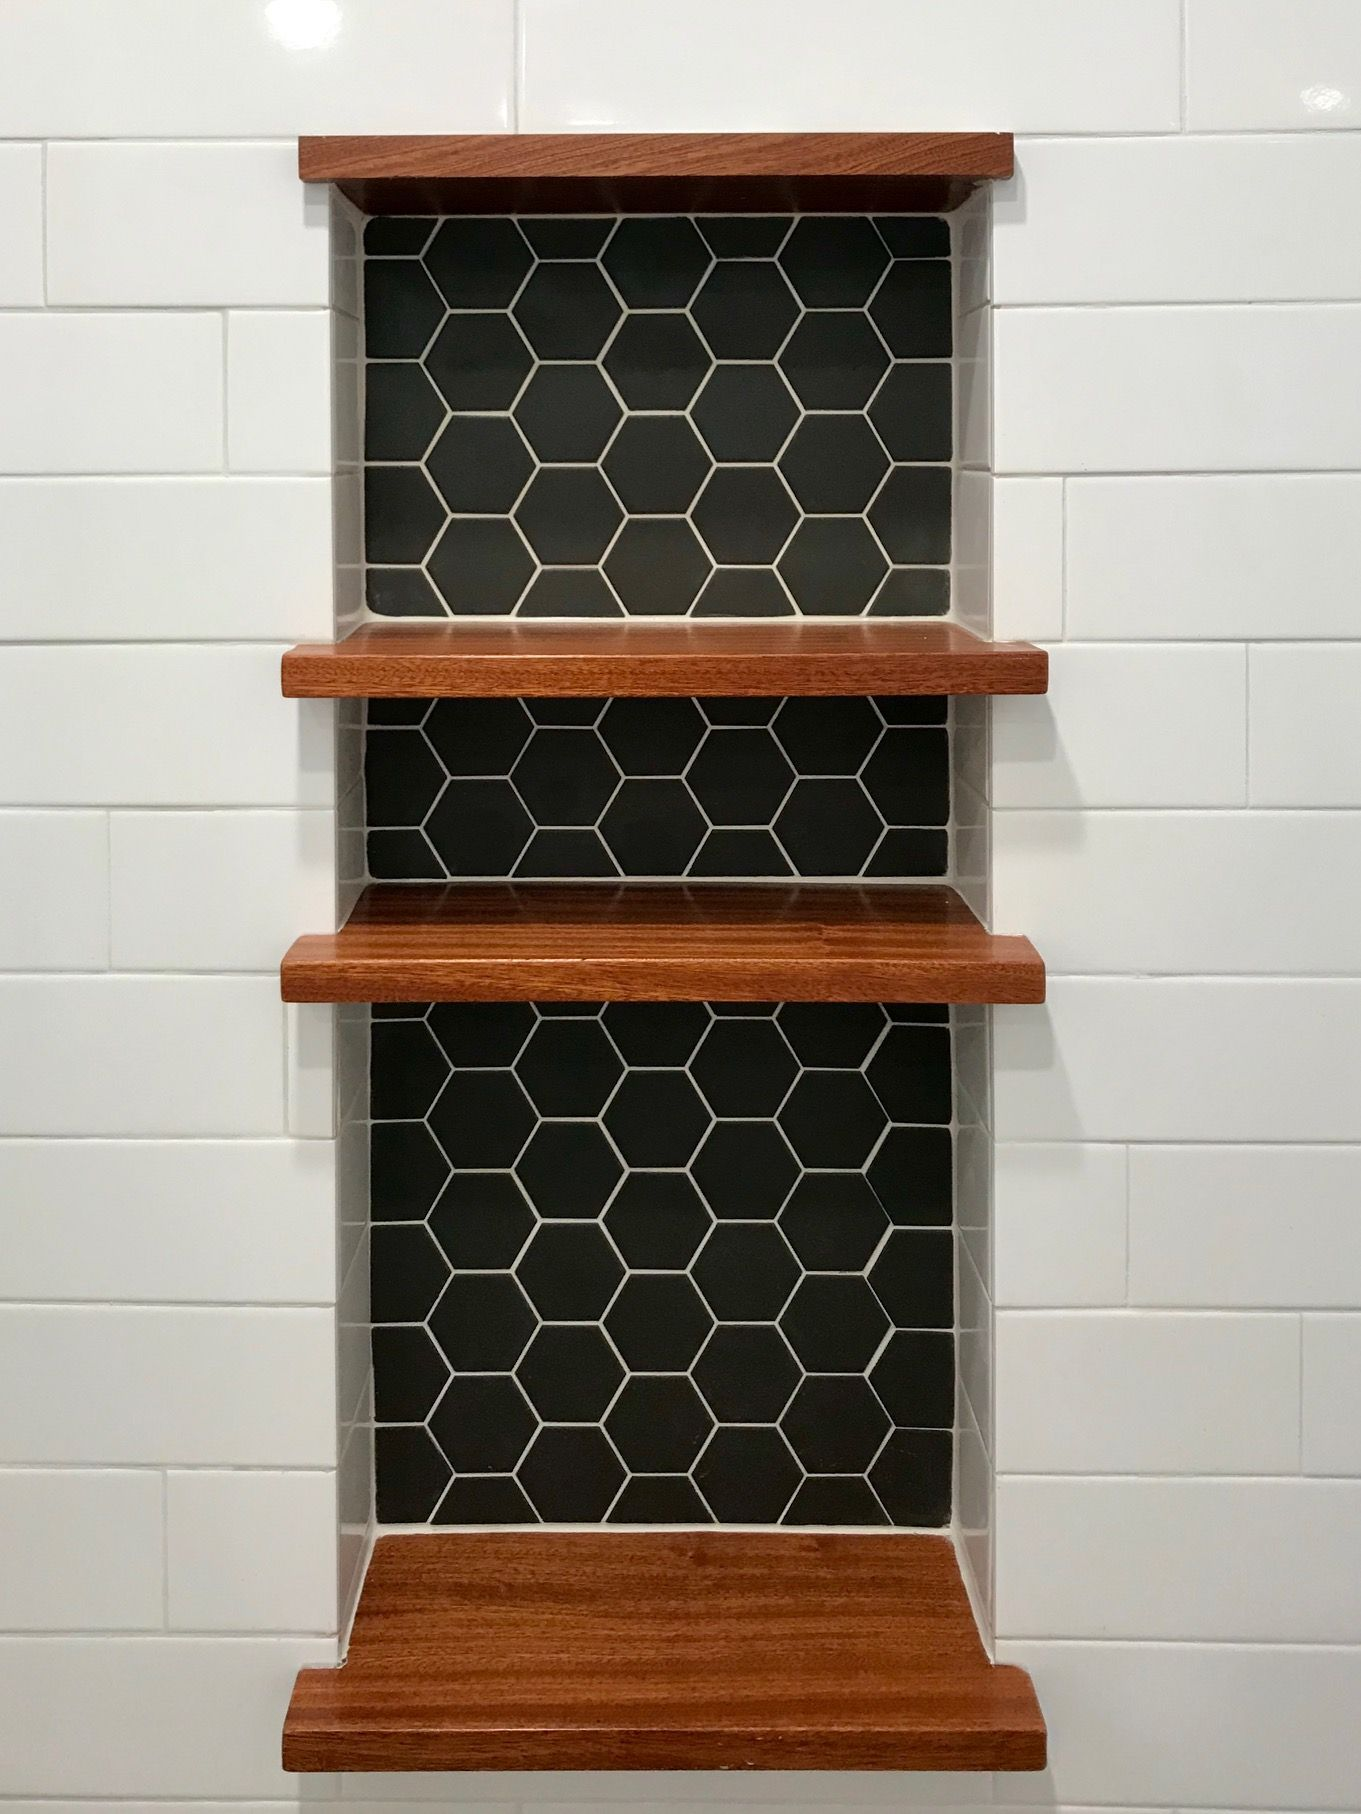 Satori Carbon Matte 12 In X 12 In Unglazed Porcelain Hexagon Wall Tile Lowes Com In 2020 Vinyl Tile Flooring Bathroom Hexagon Wall Tiles Wall Tiles